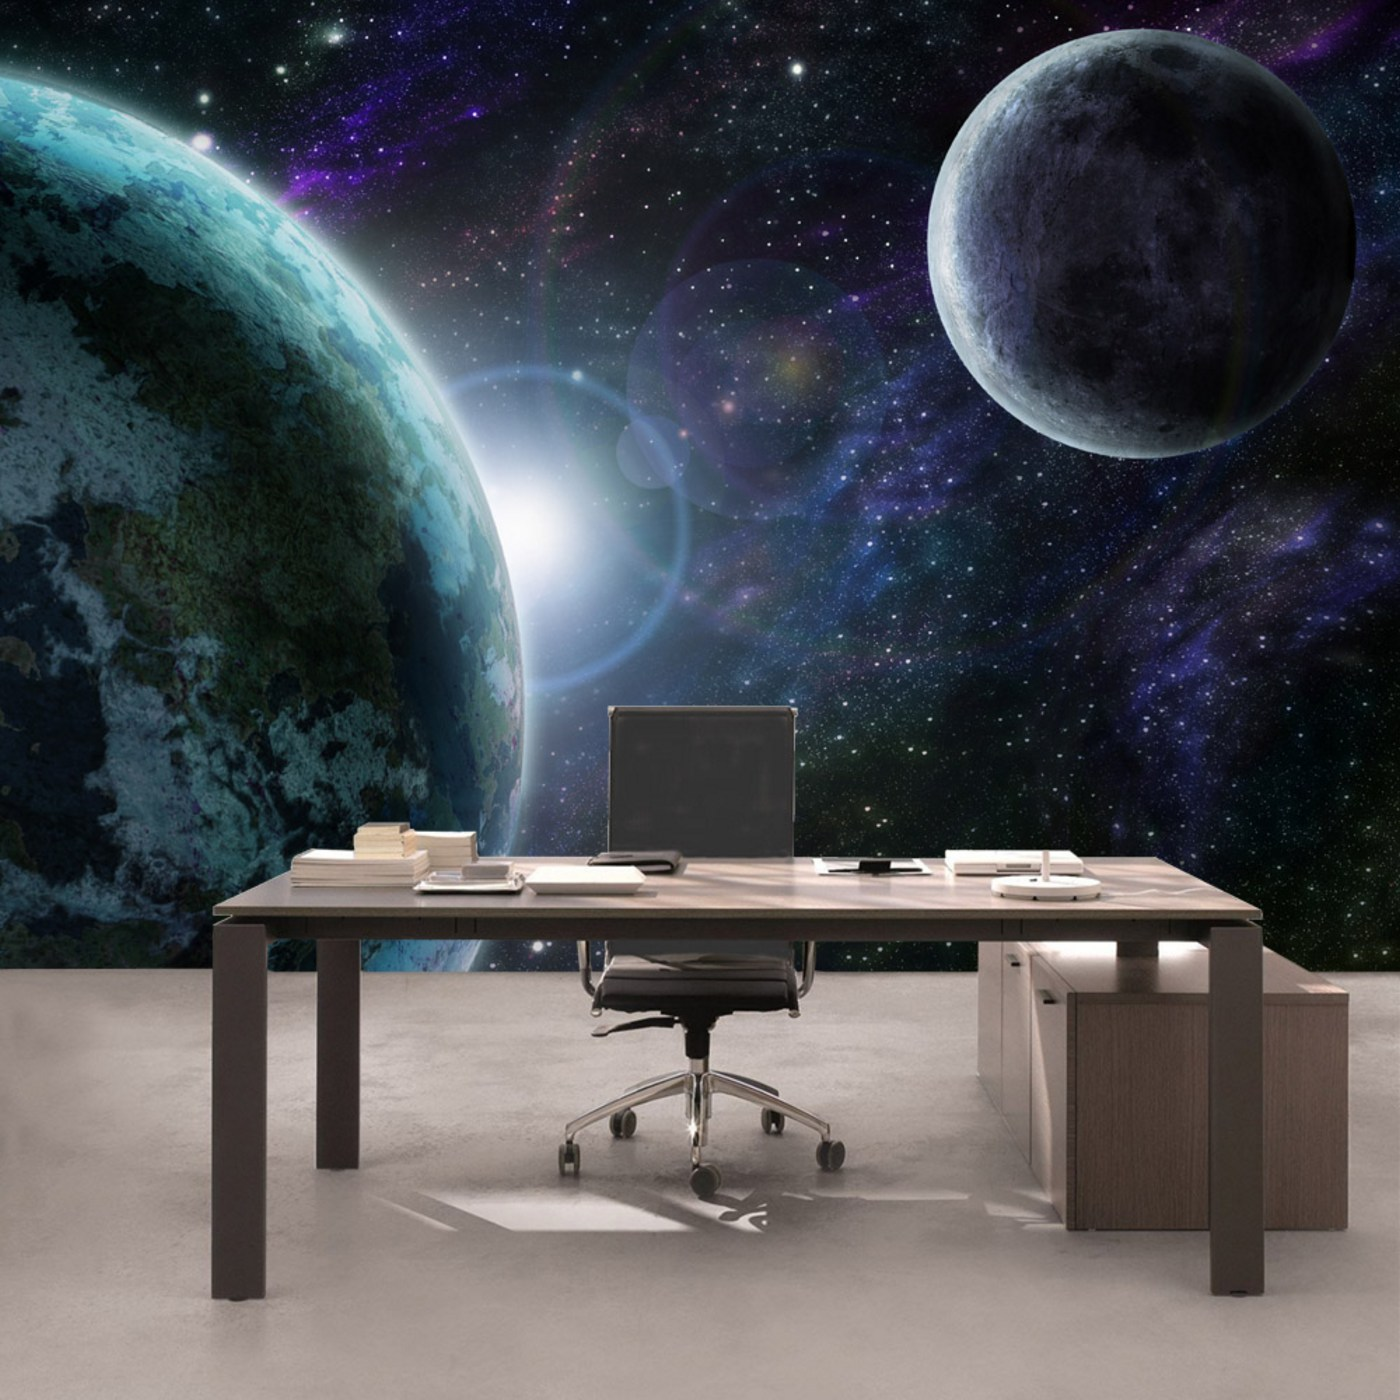 Vlies Fototapete  Welt Tapete Weltraum Erde Mond Weltall Grau